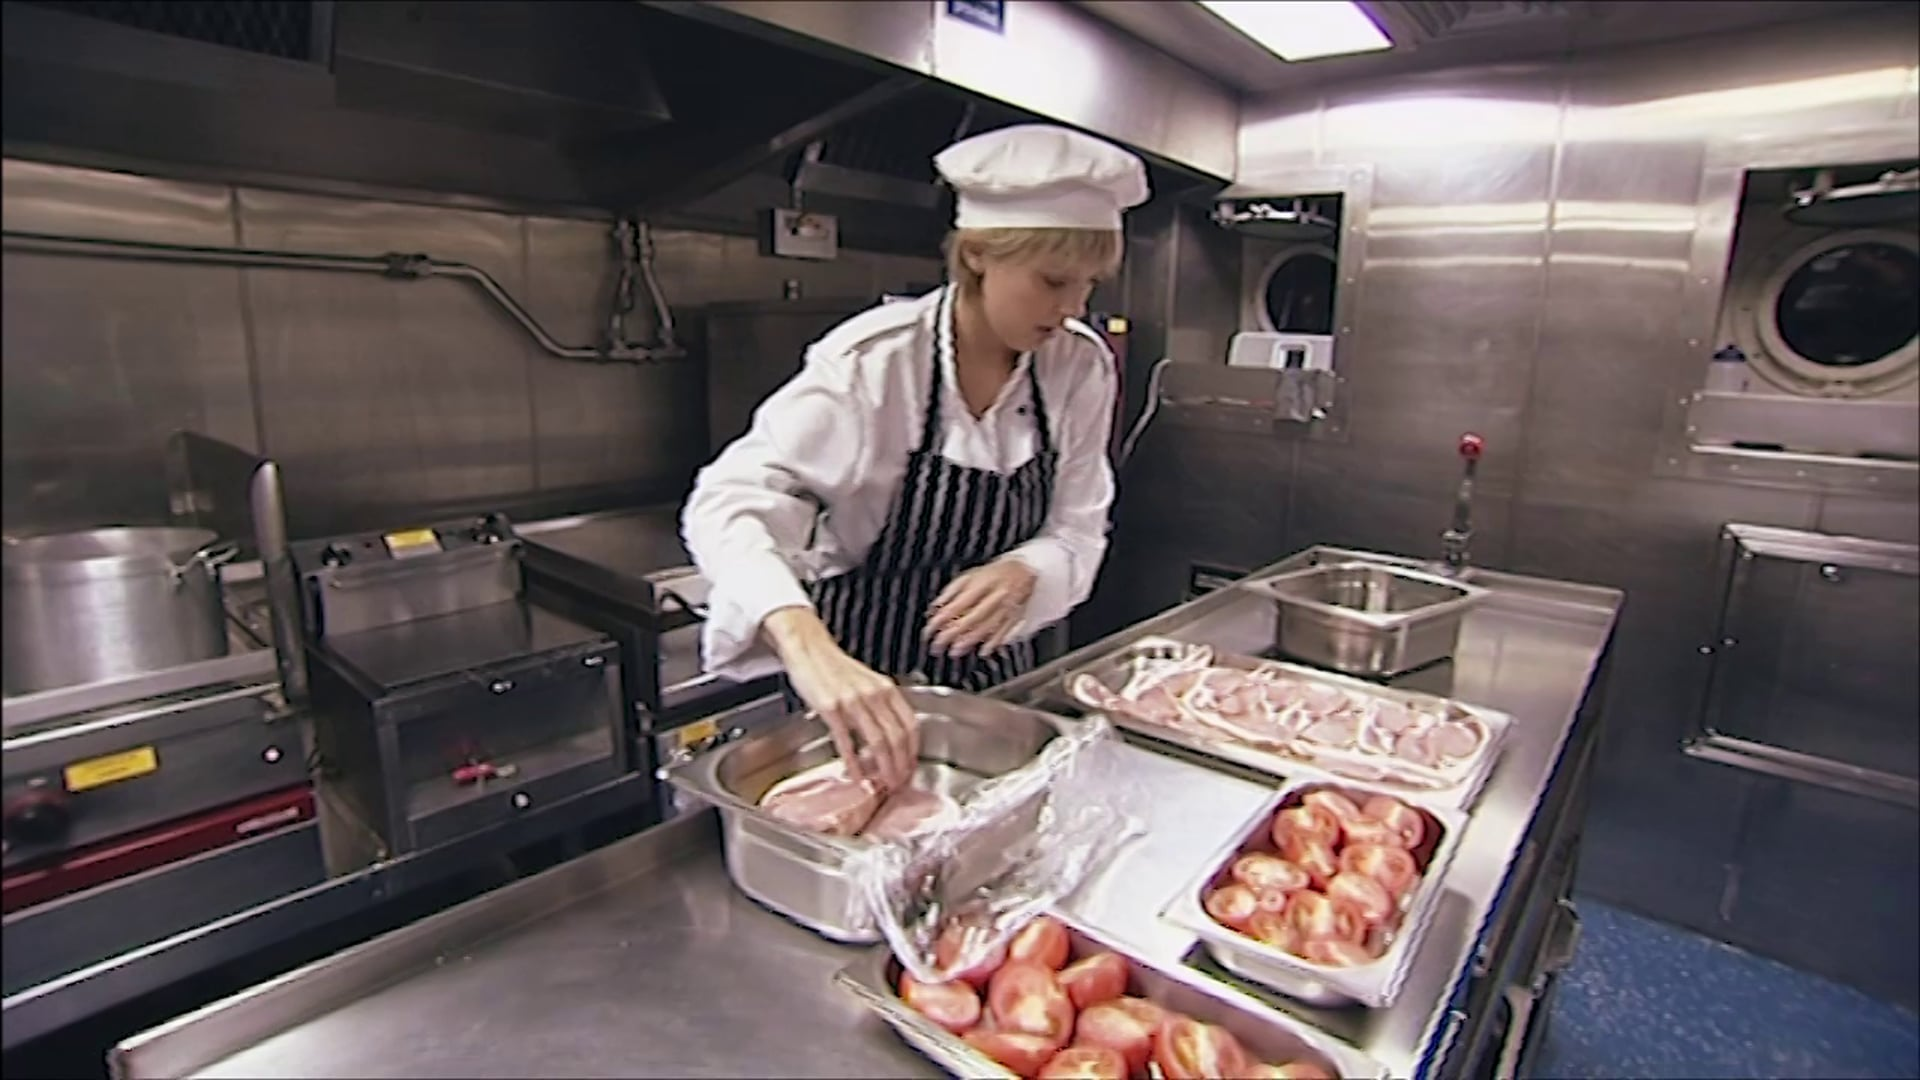 Royal Navy Two Six 'Breakfast'